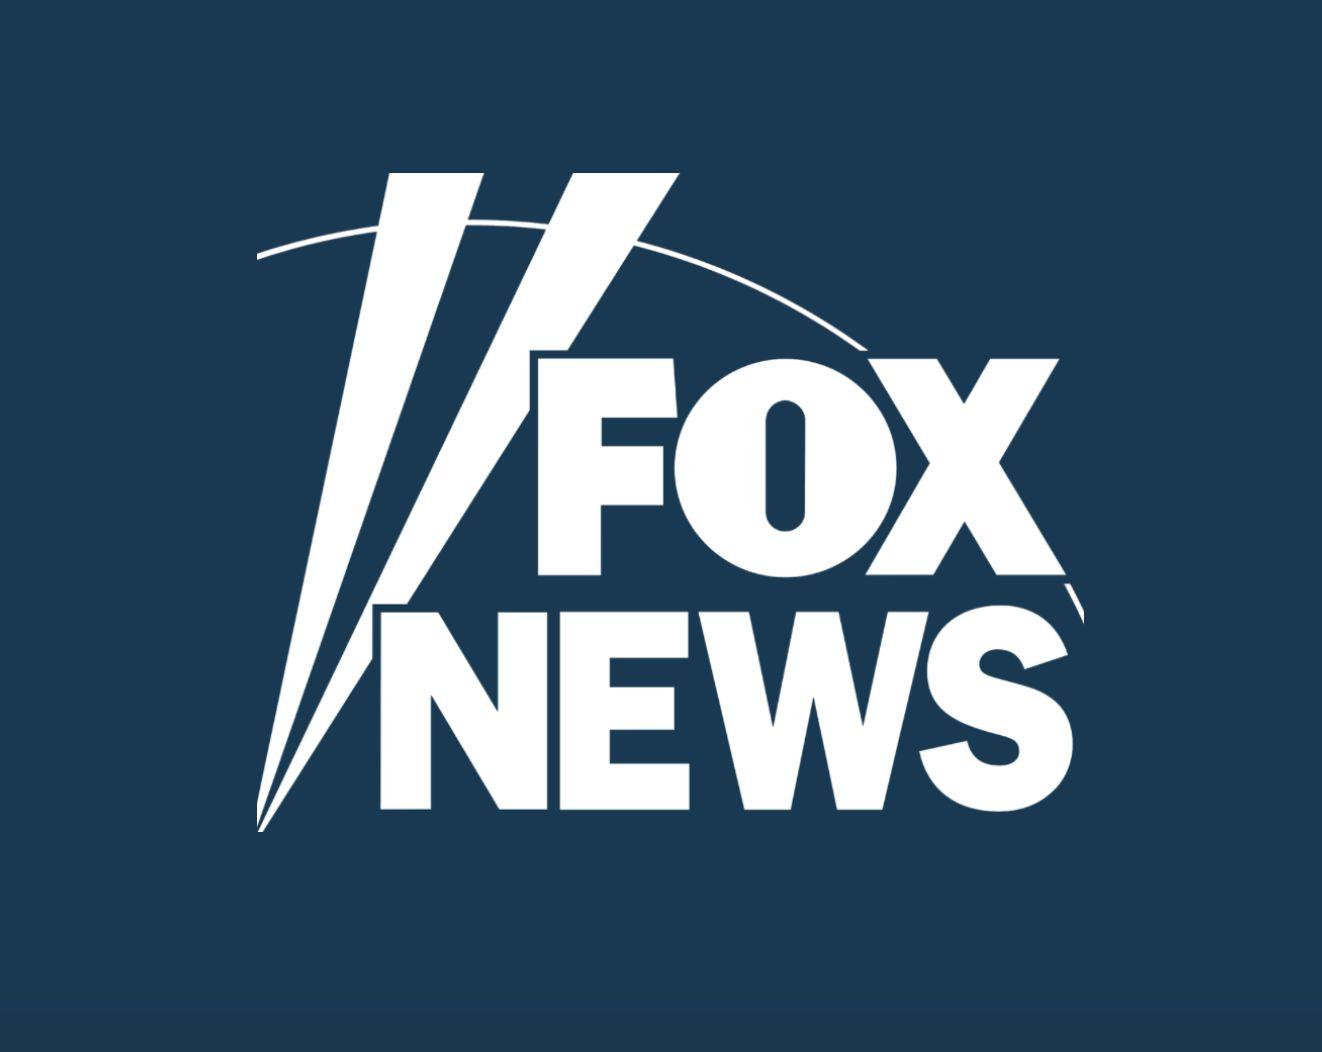 Fox news blank template imgflip high quality fox news blank meme template maxwellsz